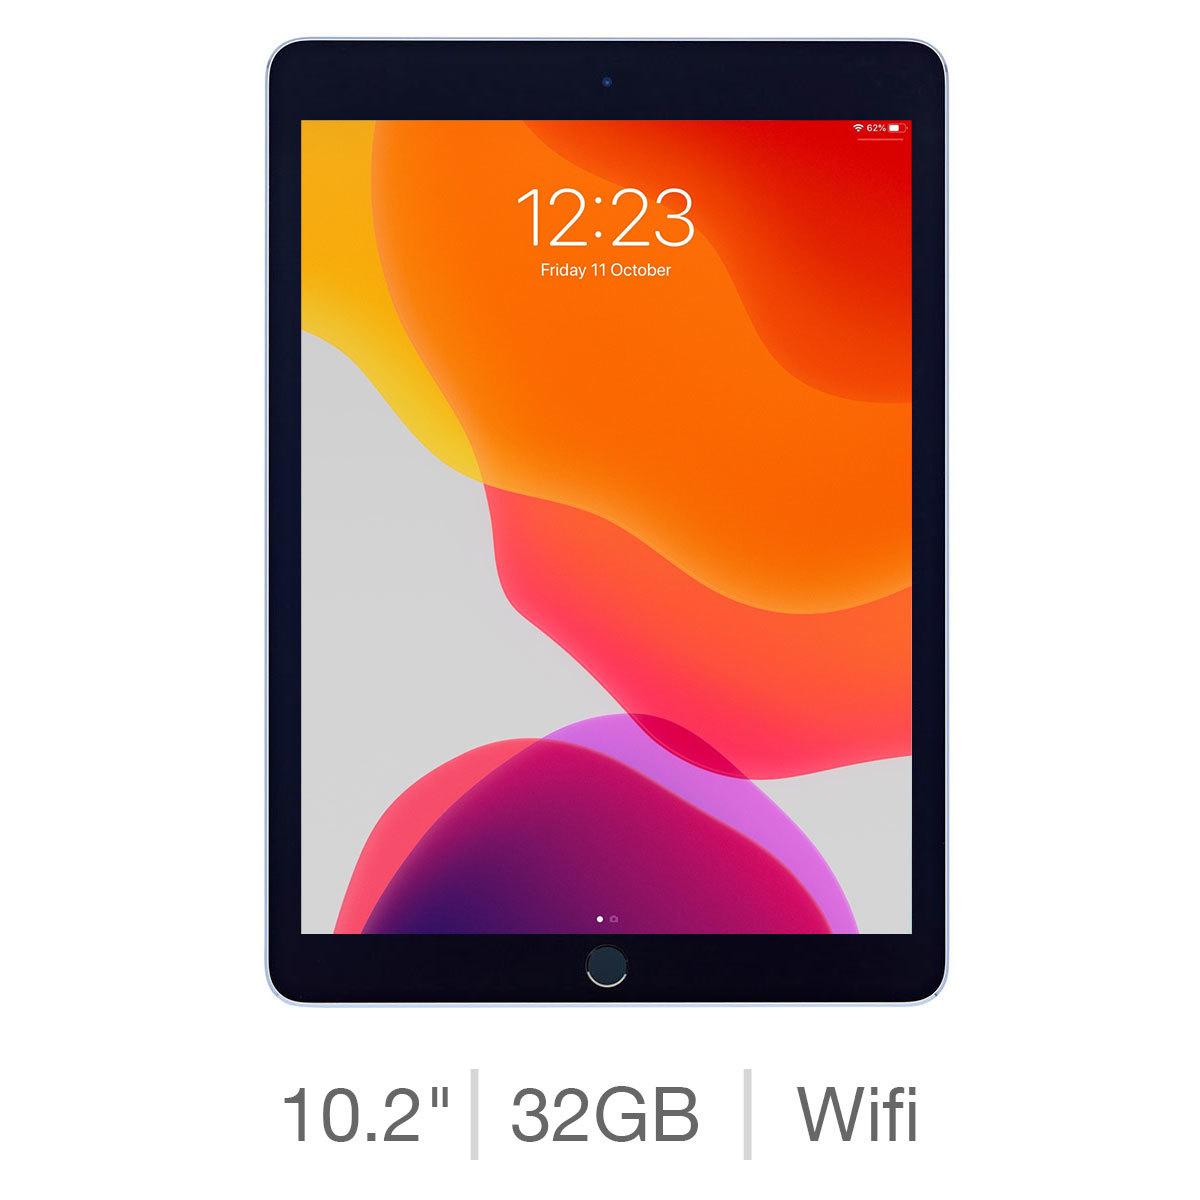 Apple iPad 2019 32GB Space Grey £279.99 w/ Voucher @ Costco